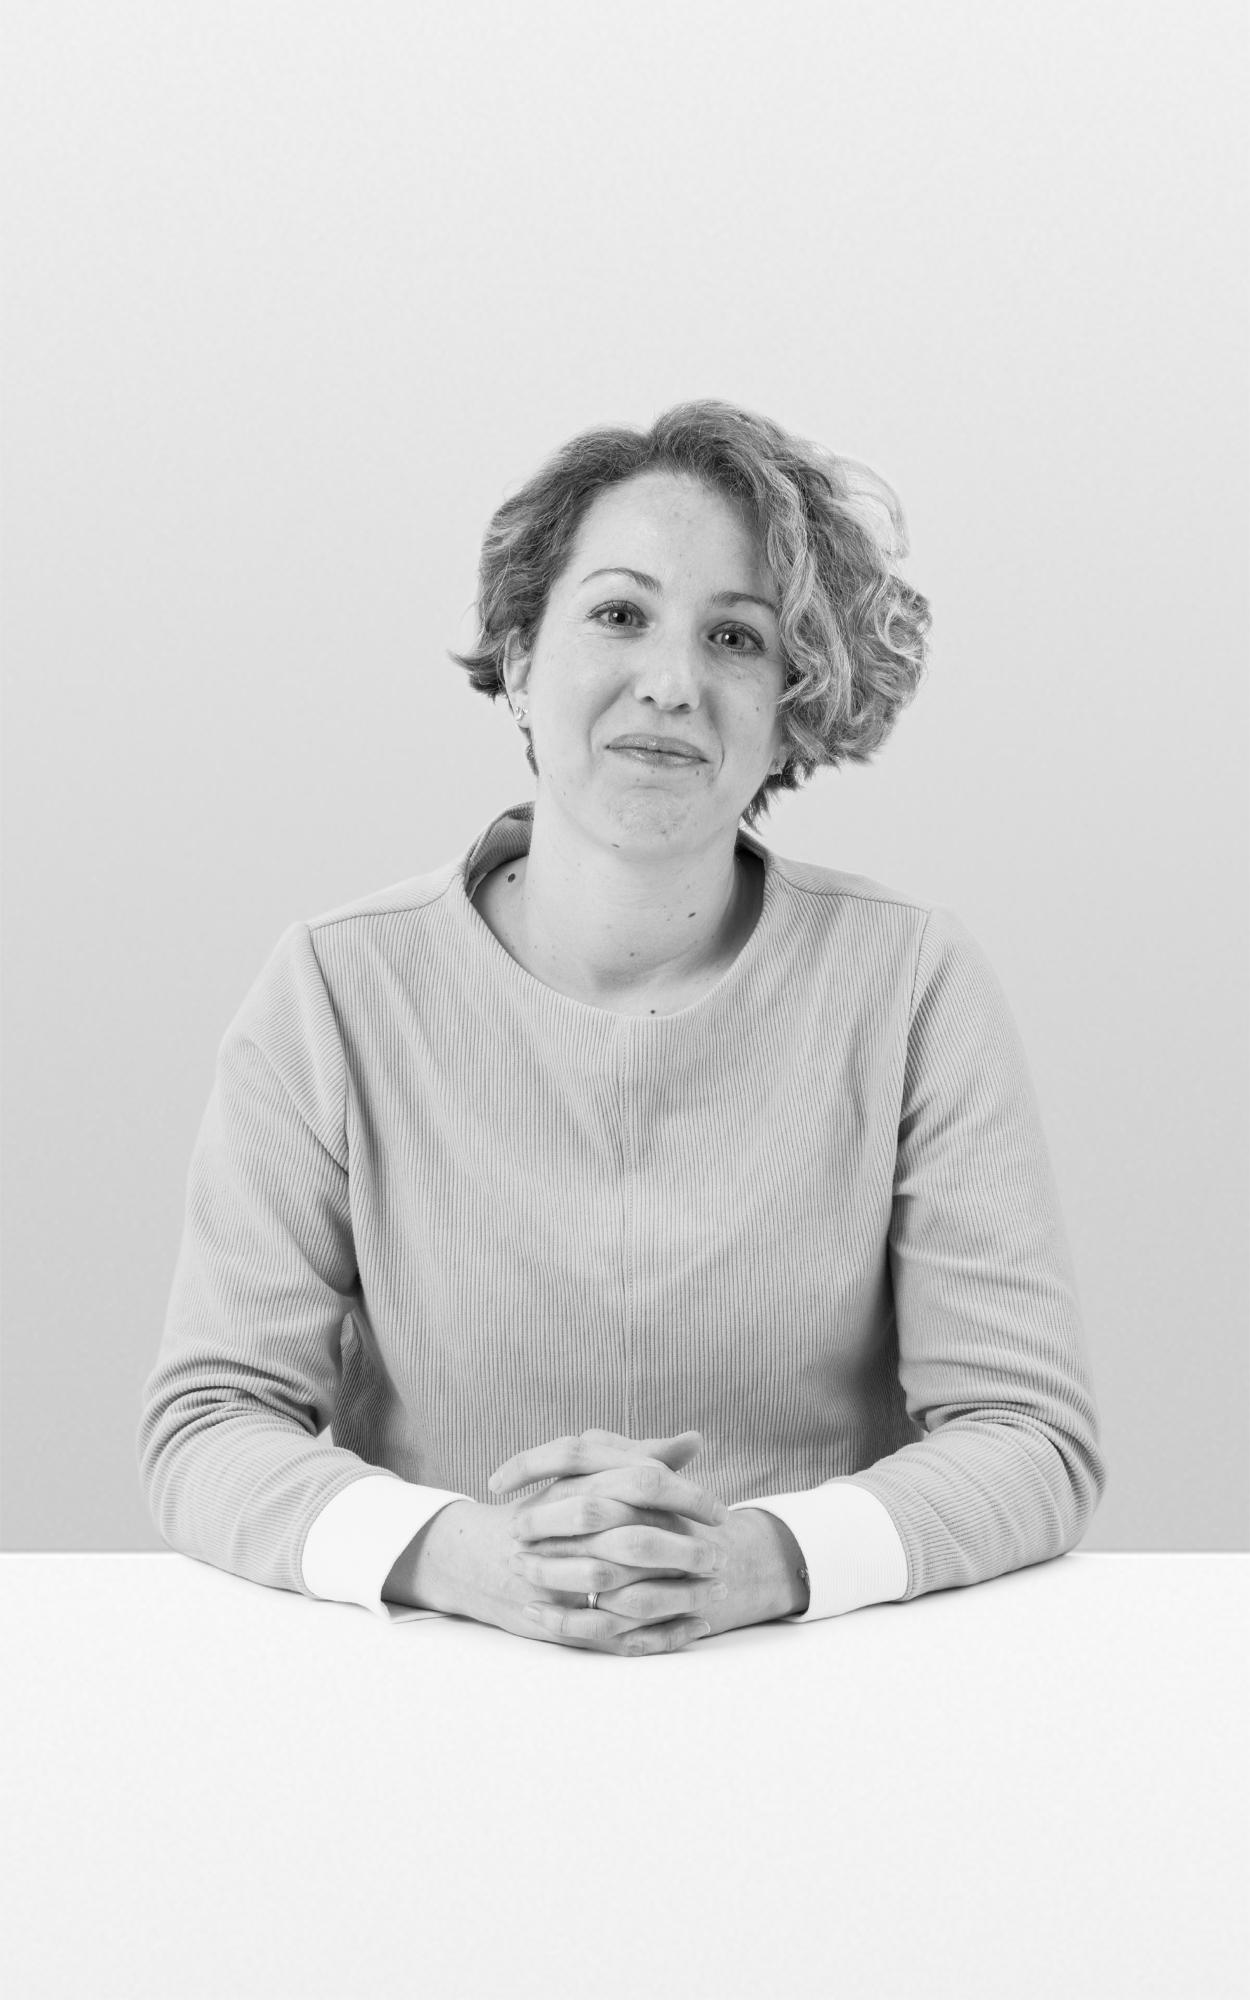 Christelle Foulon